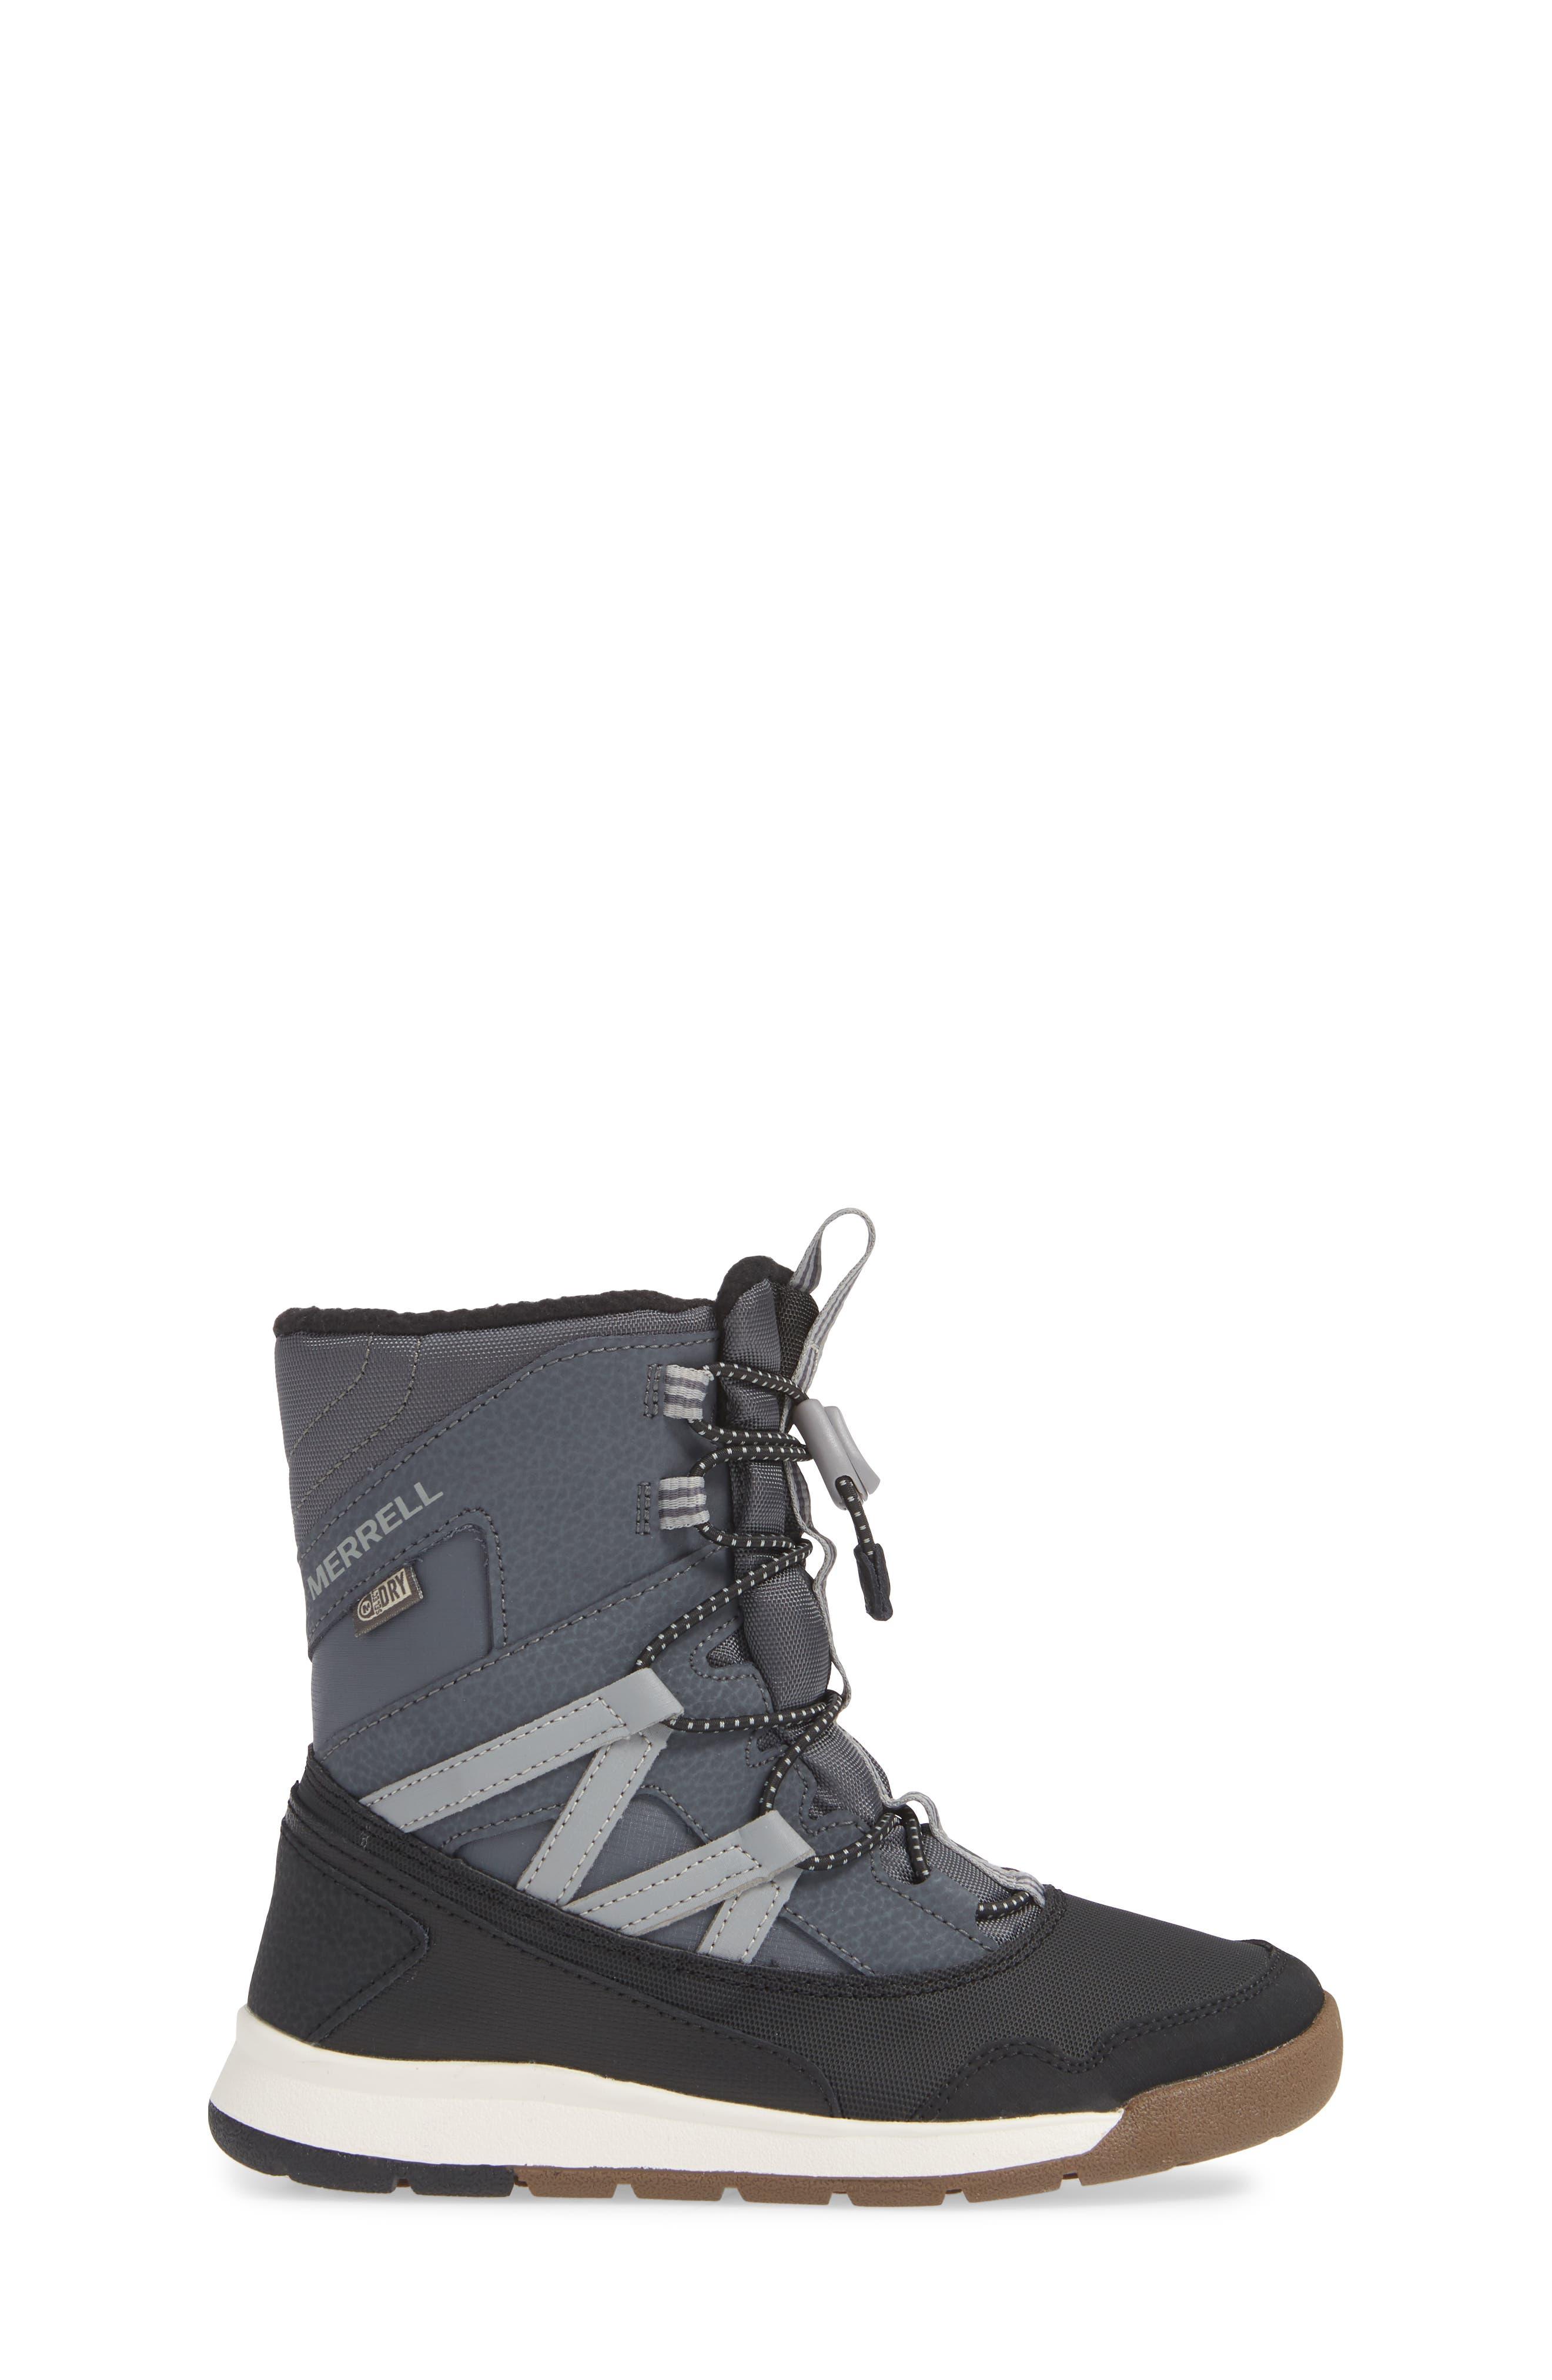 MERRELL, Snow Crush Waterproof Snow Boot, Alternate thumbnail 3, color, 020